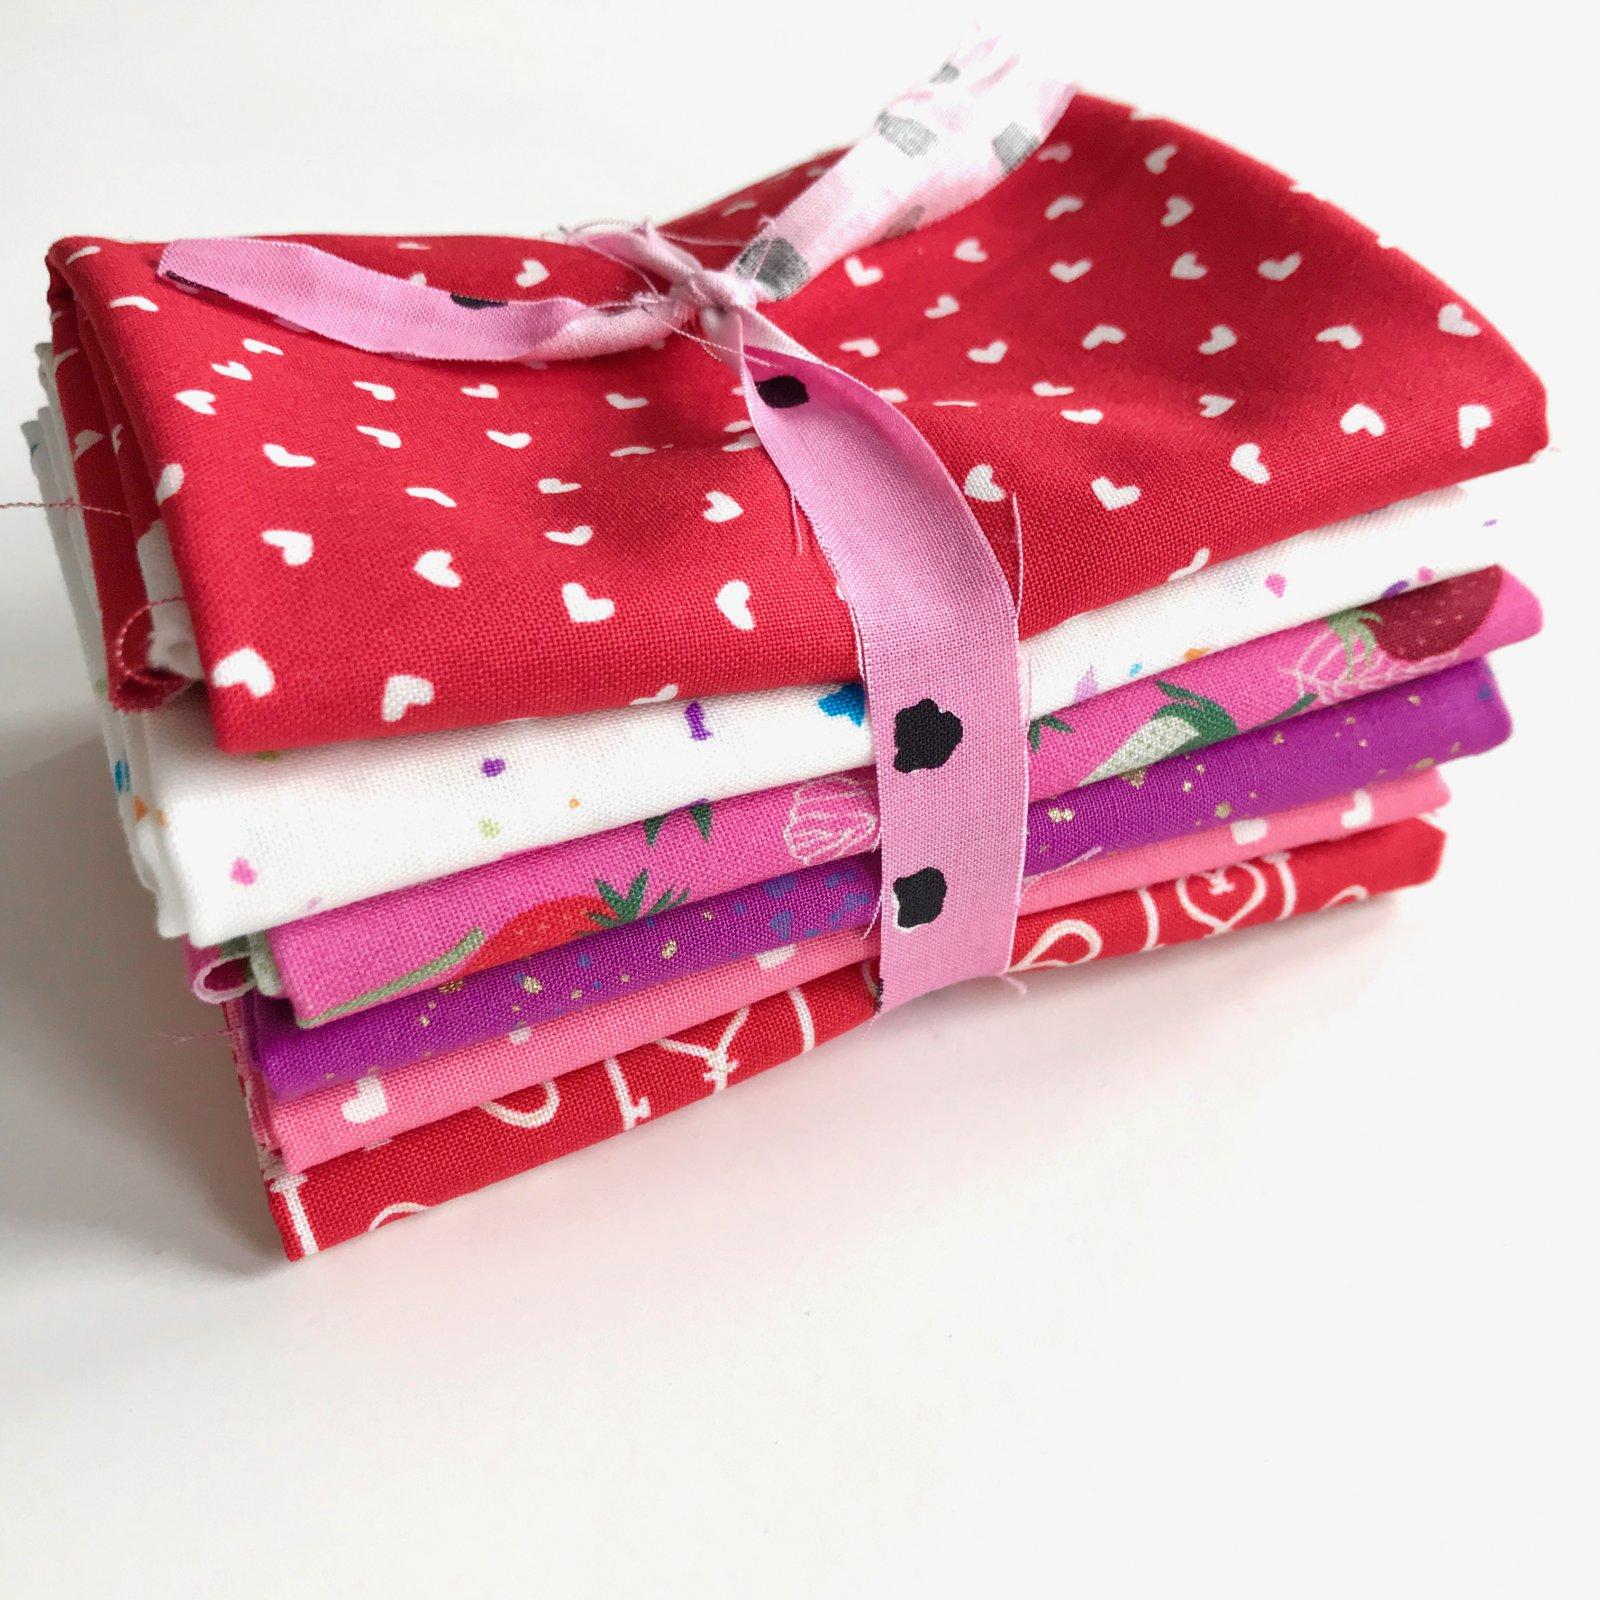 FQ Bundle - Sweethearts - 6 Quilting Cotton Fat Quarters